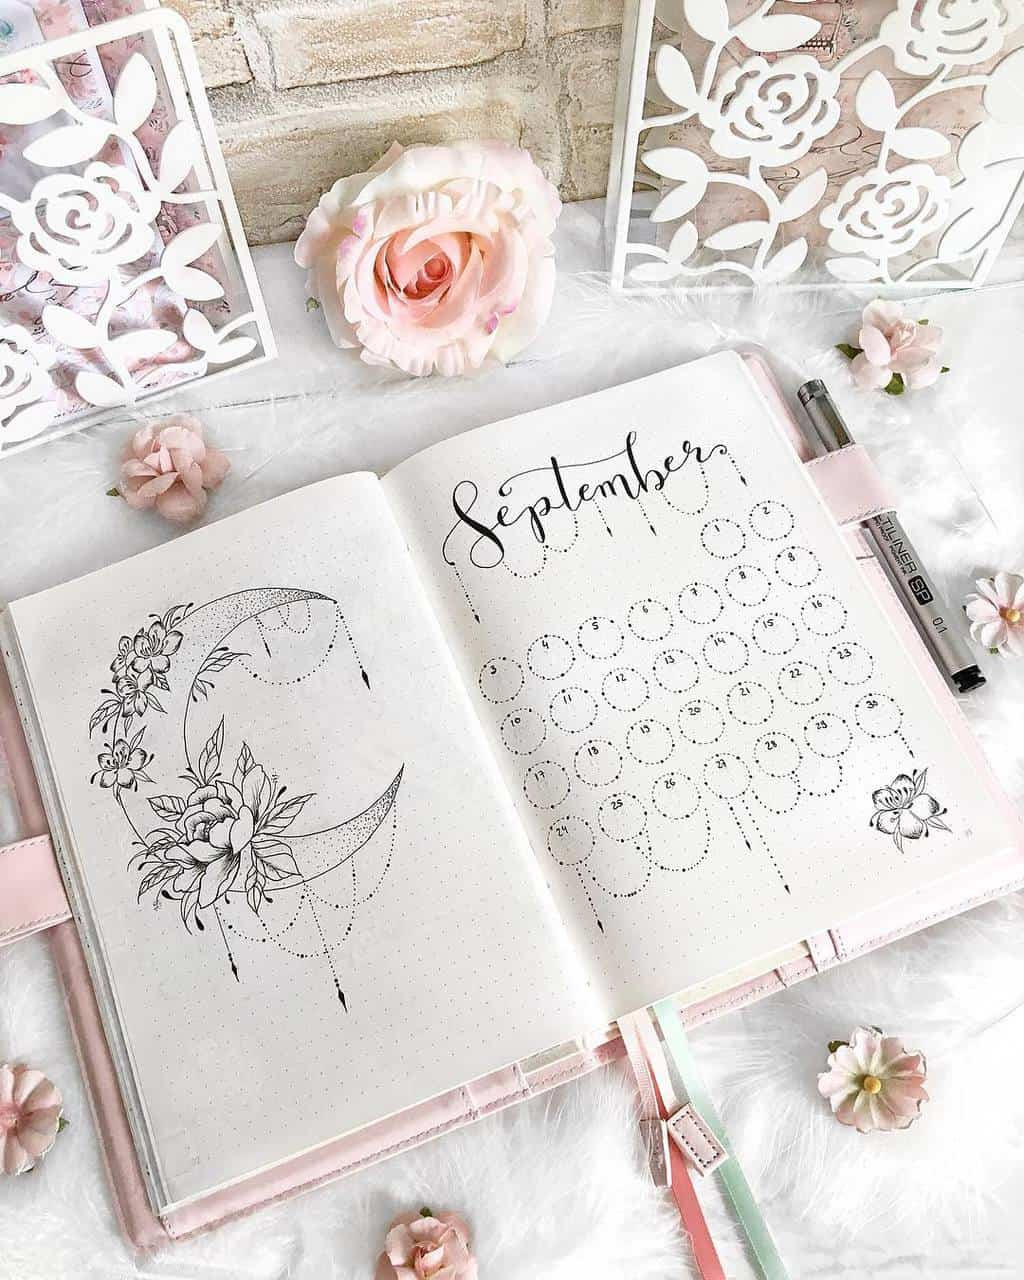 Boho Bullet Journal Theme Inspirations - spread by @bella_rica_design | Masha Plans